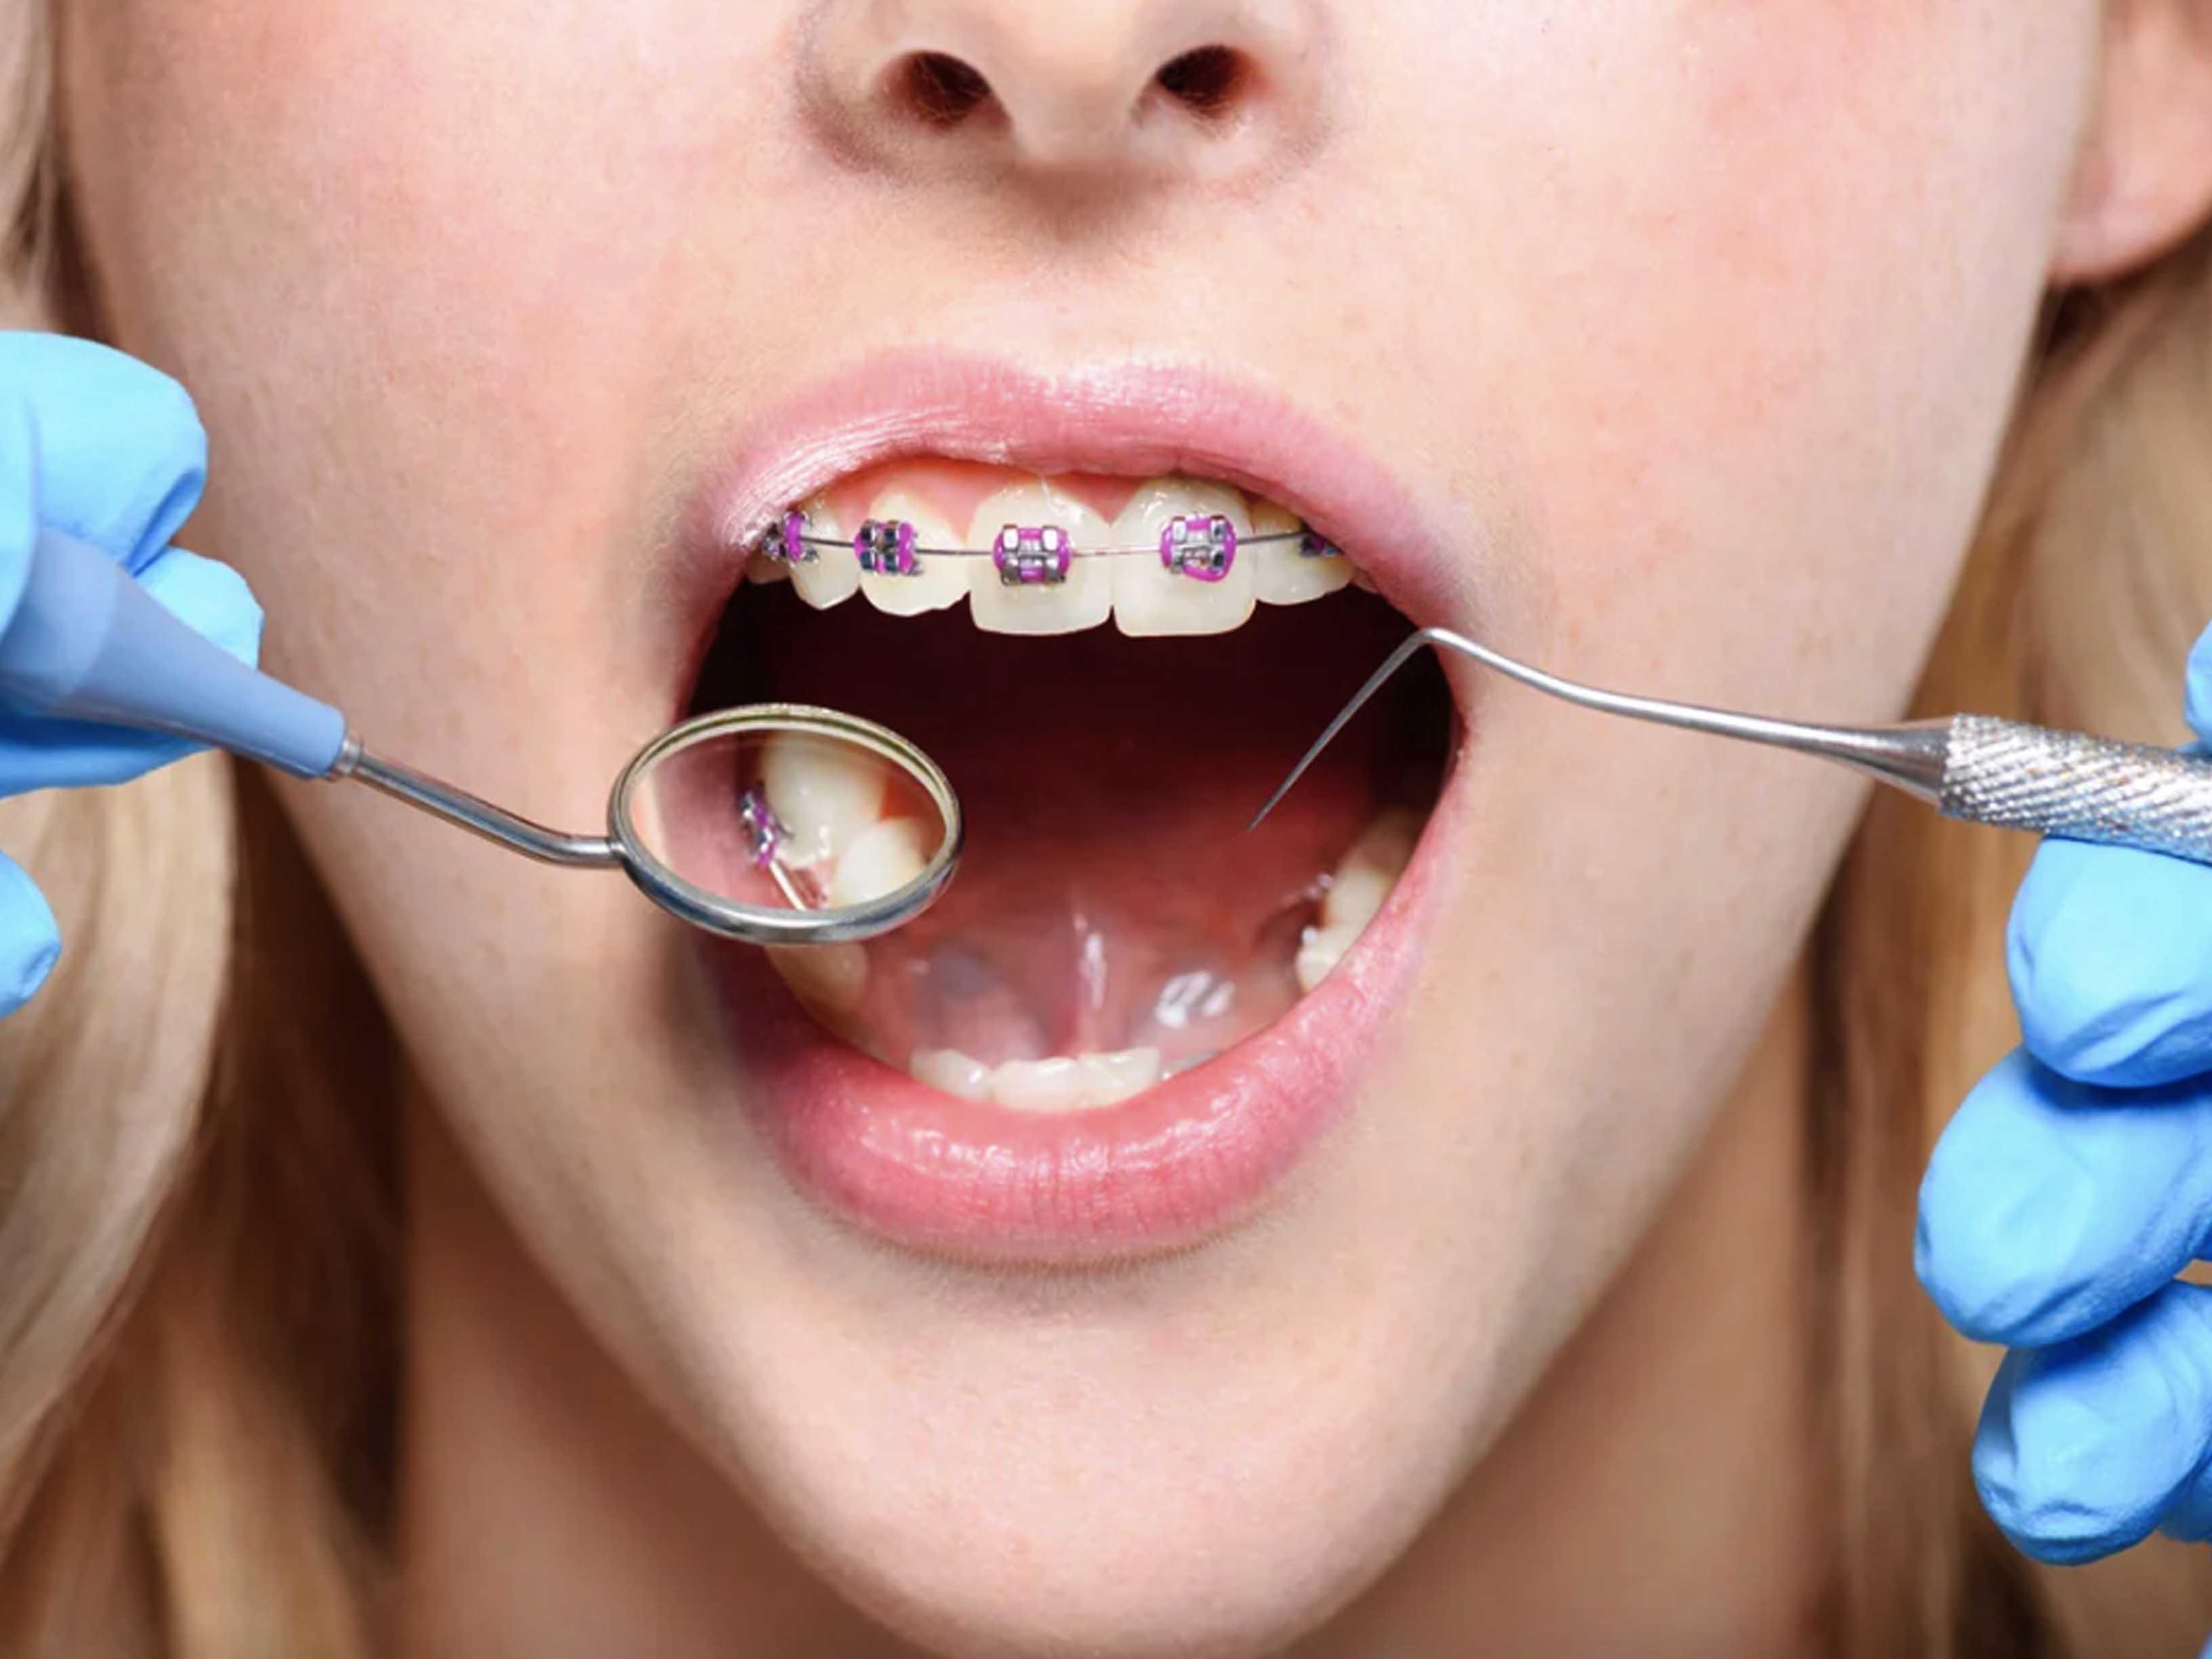 Болят зубы от брекетов.